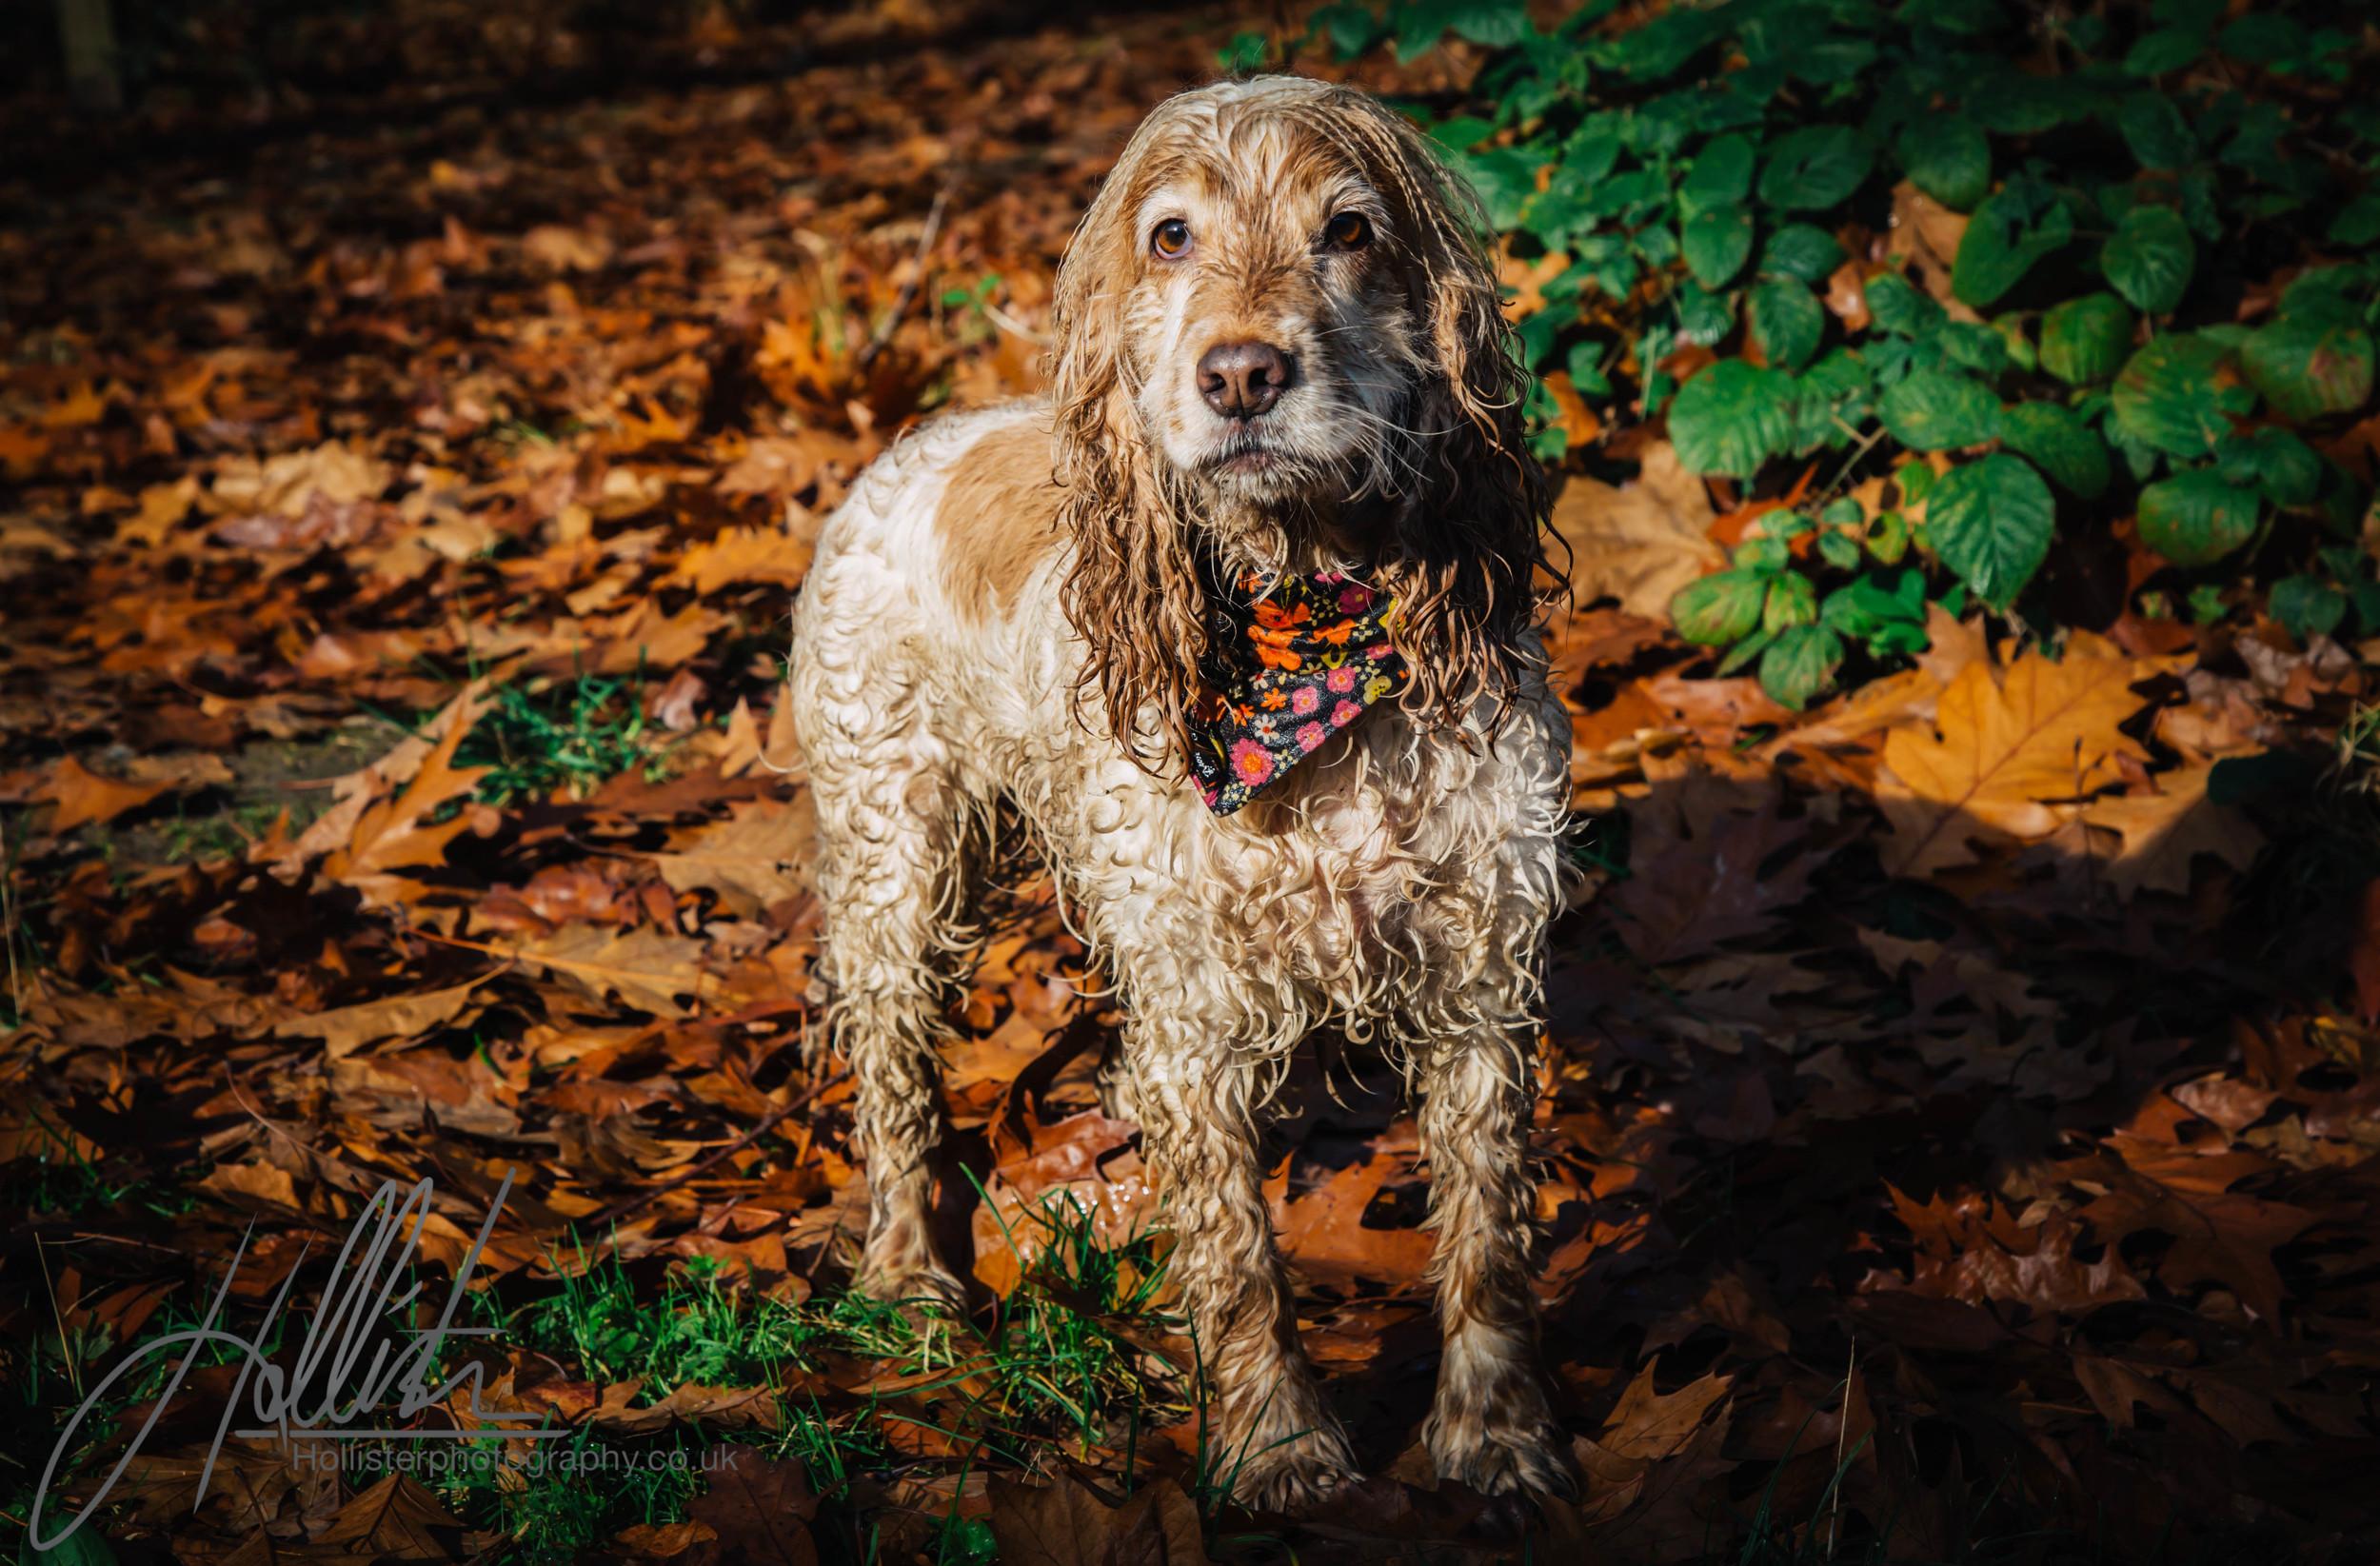 Hollisterphotography ABBY CLOWES WOOD DOG WALK-81.JPG